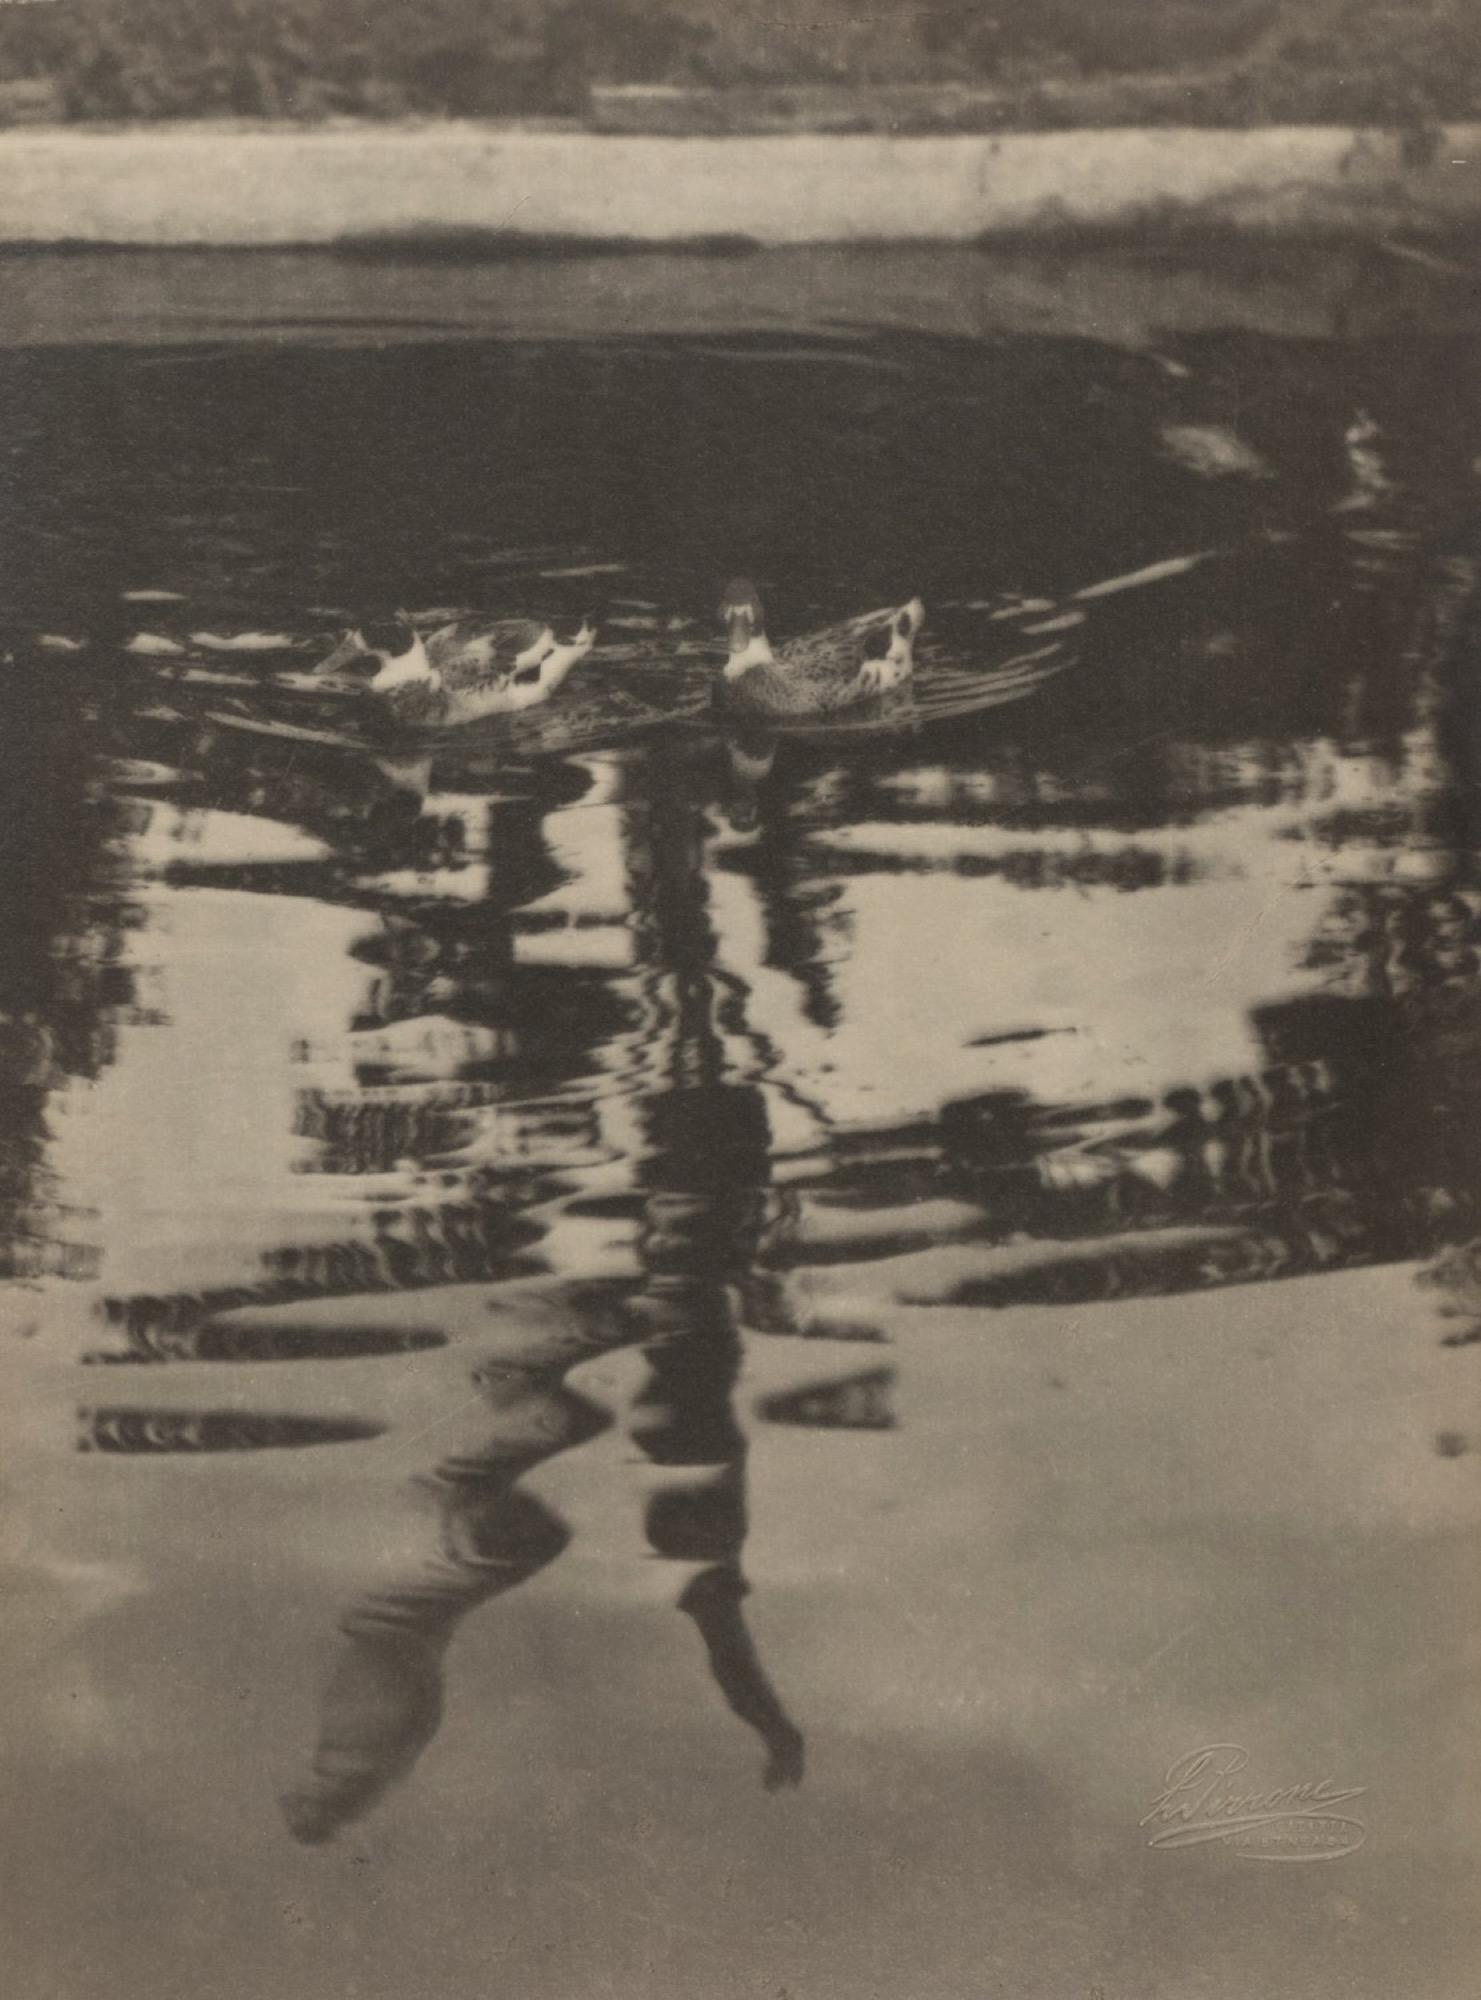 Luigi Pirrone (1898-1979) - Specchio d'acqua, years 1930 - Vintage gelatin silver [...]